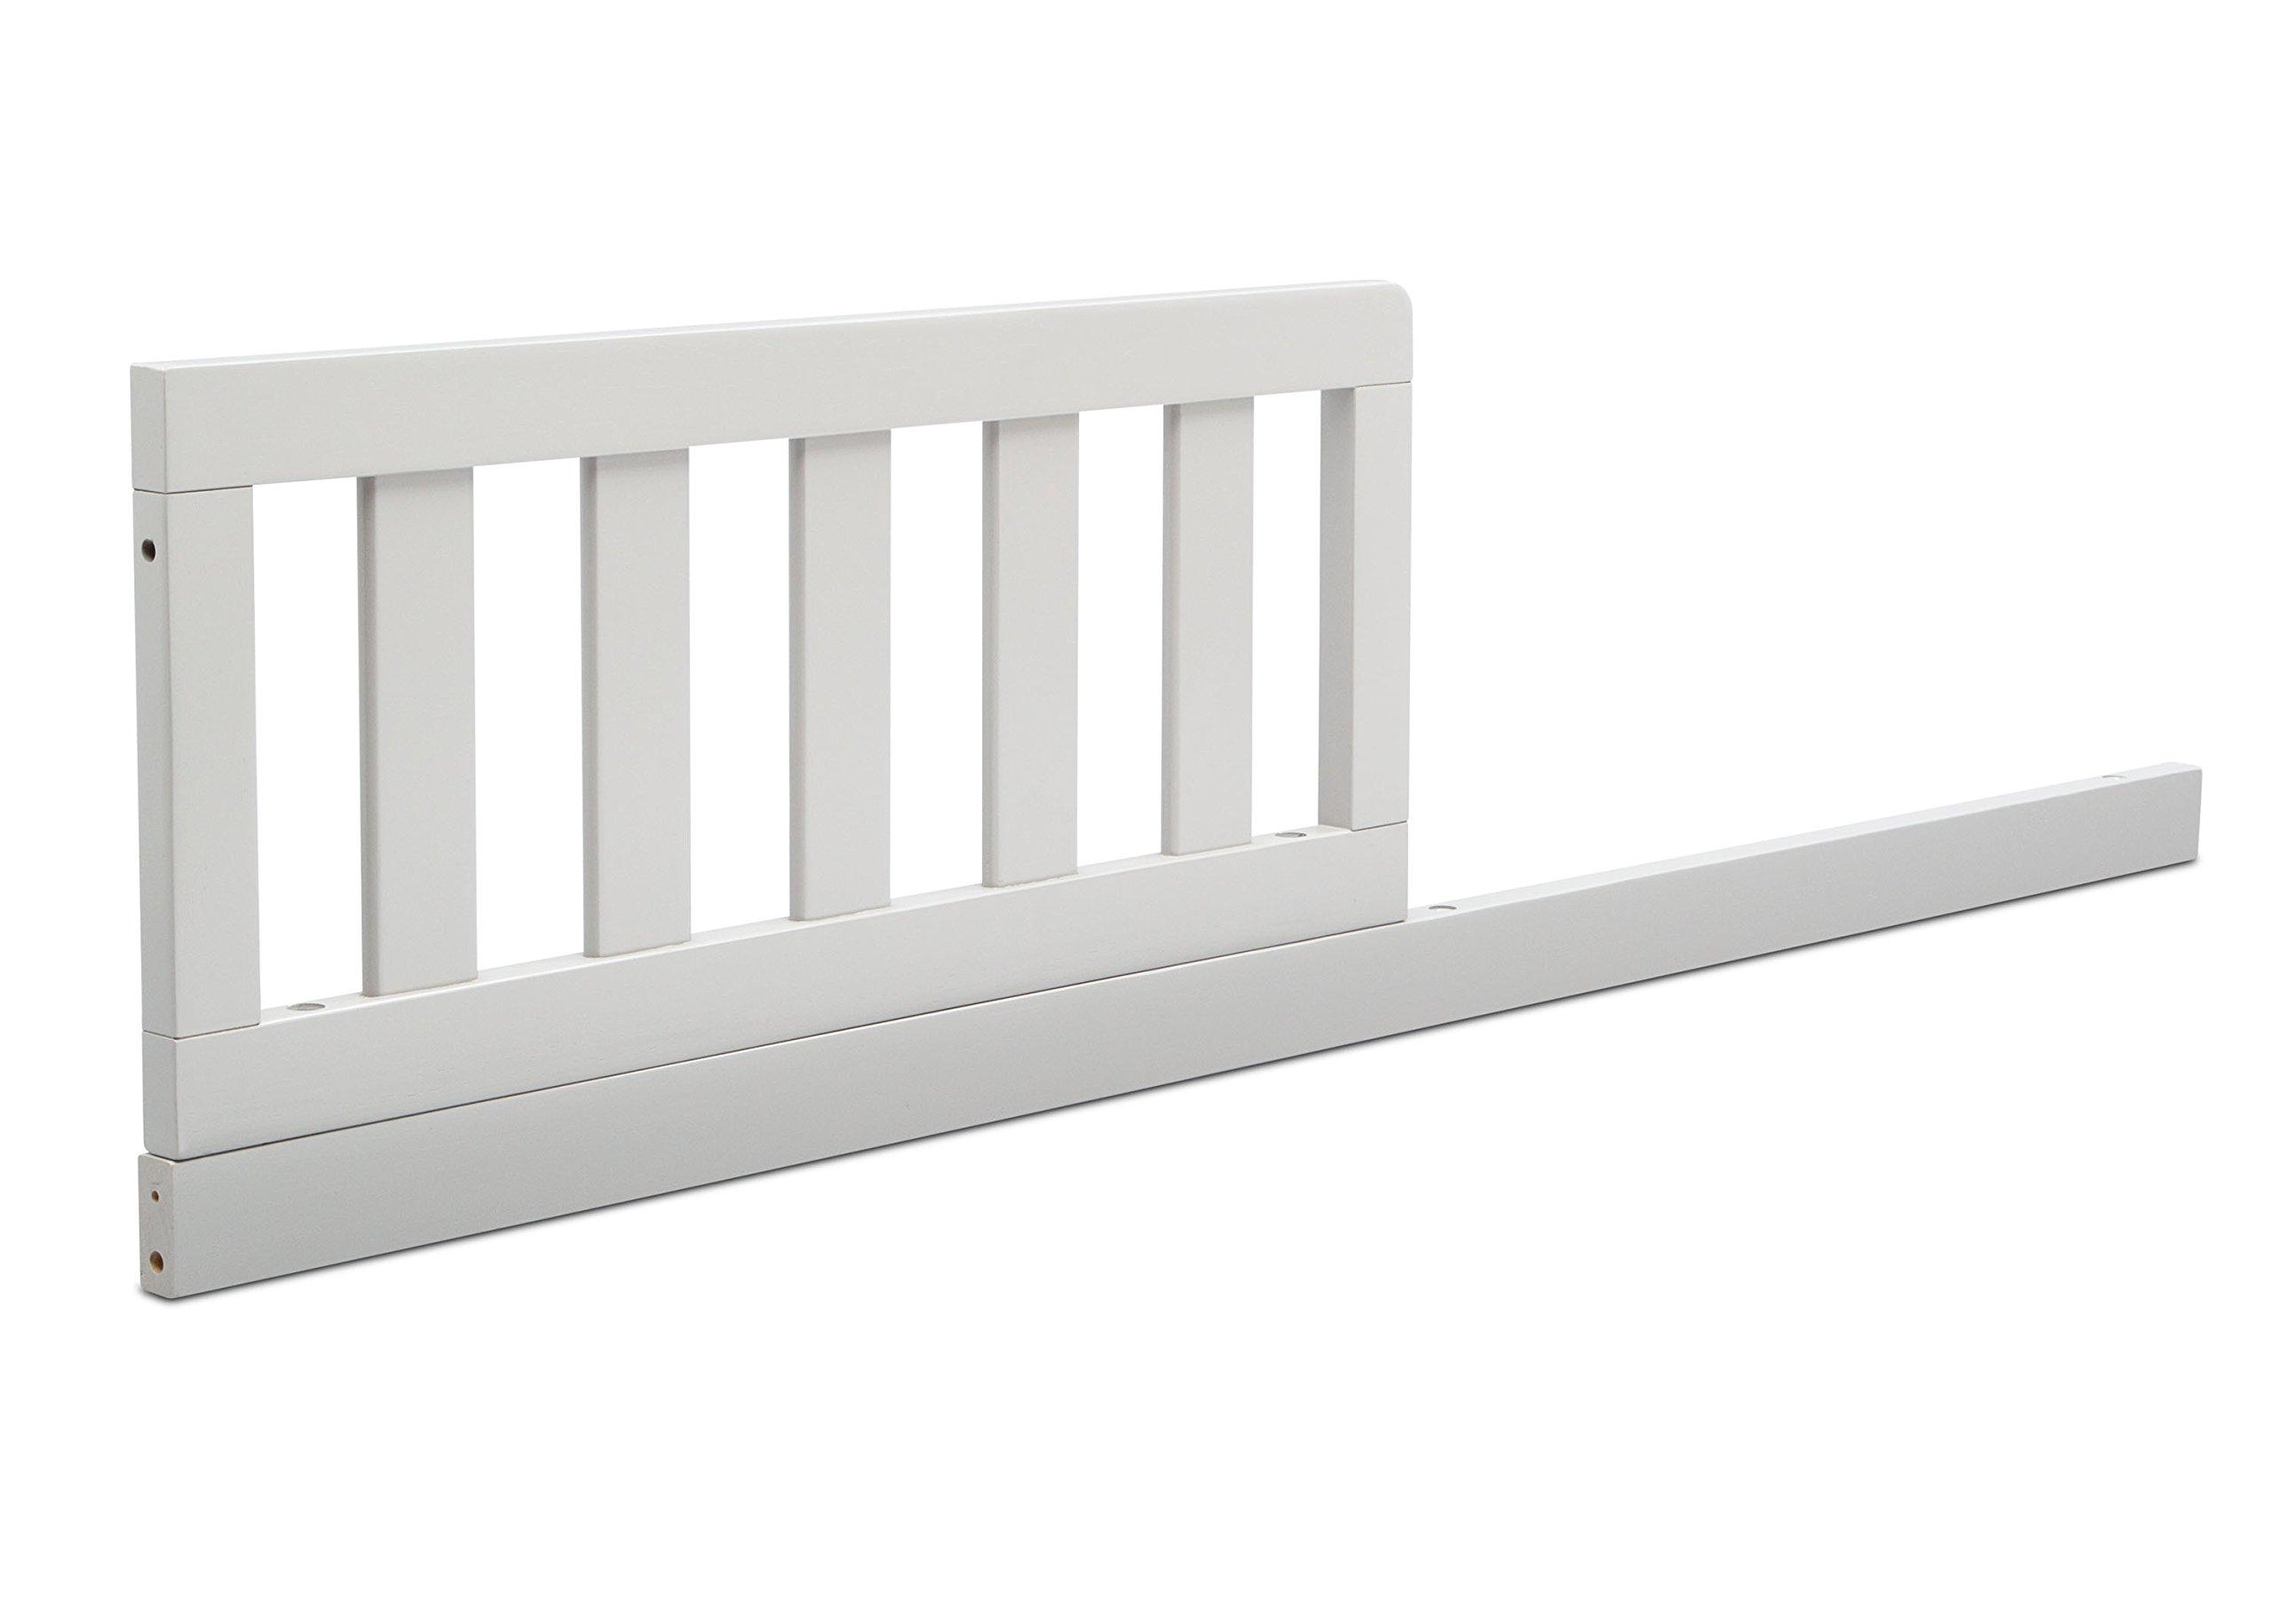 Serta Daybed/Toddler Guardrail Kit #707725, Bianca White by Serta